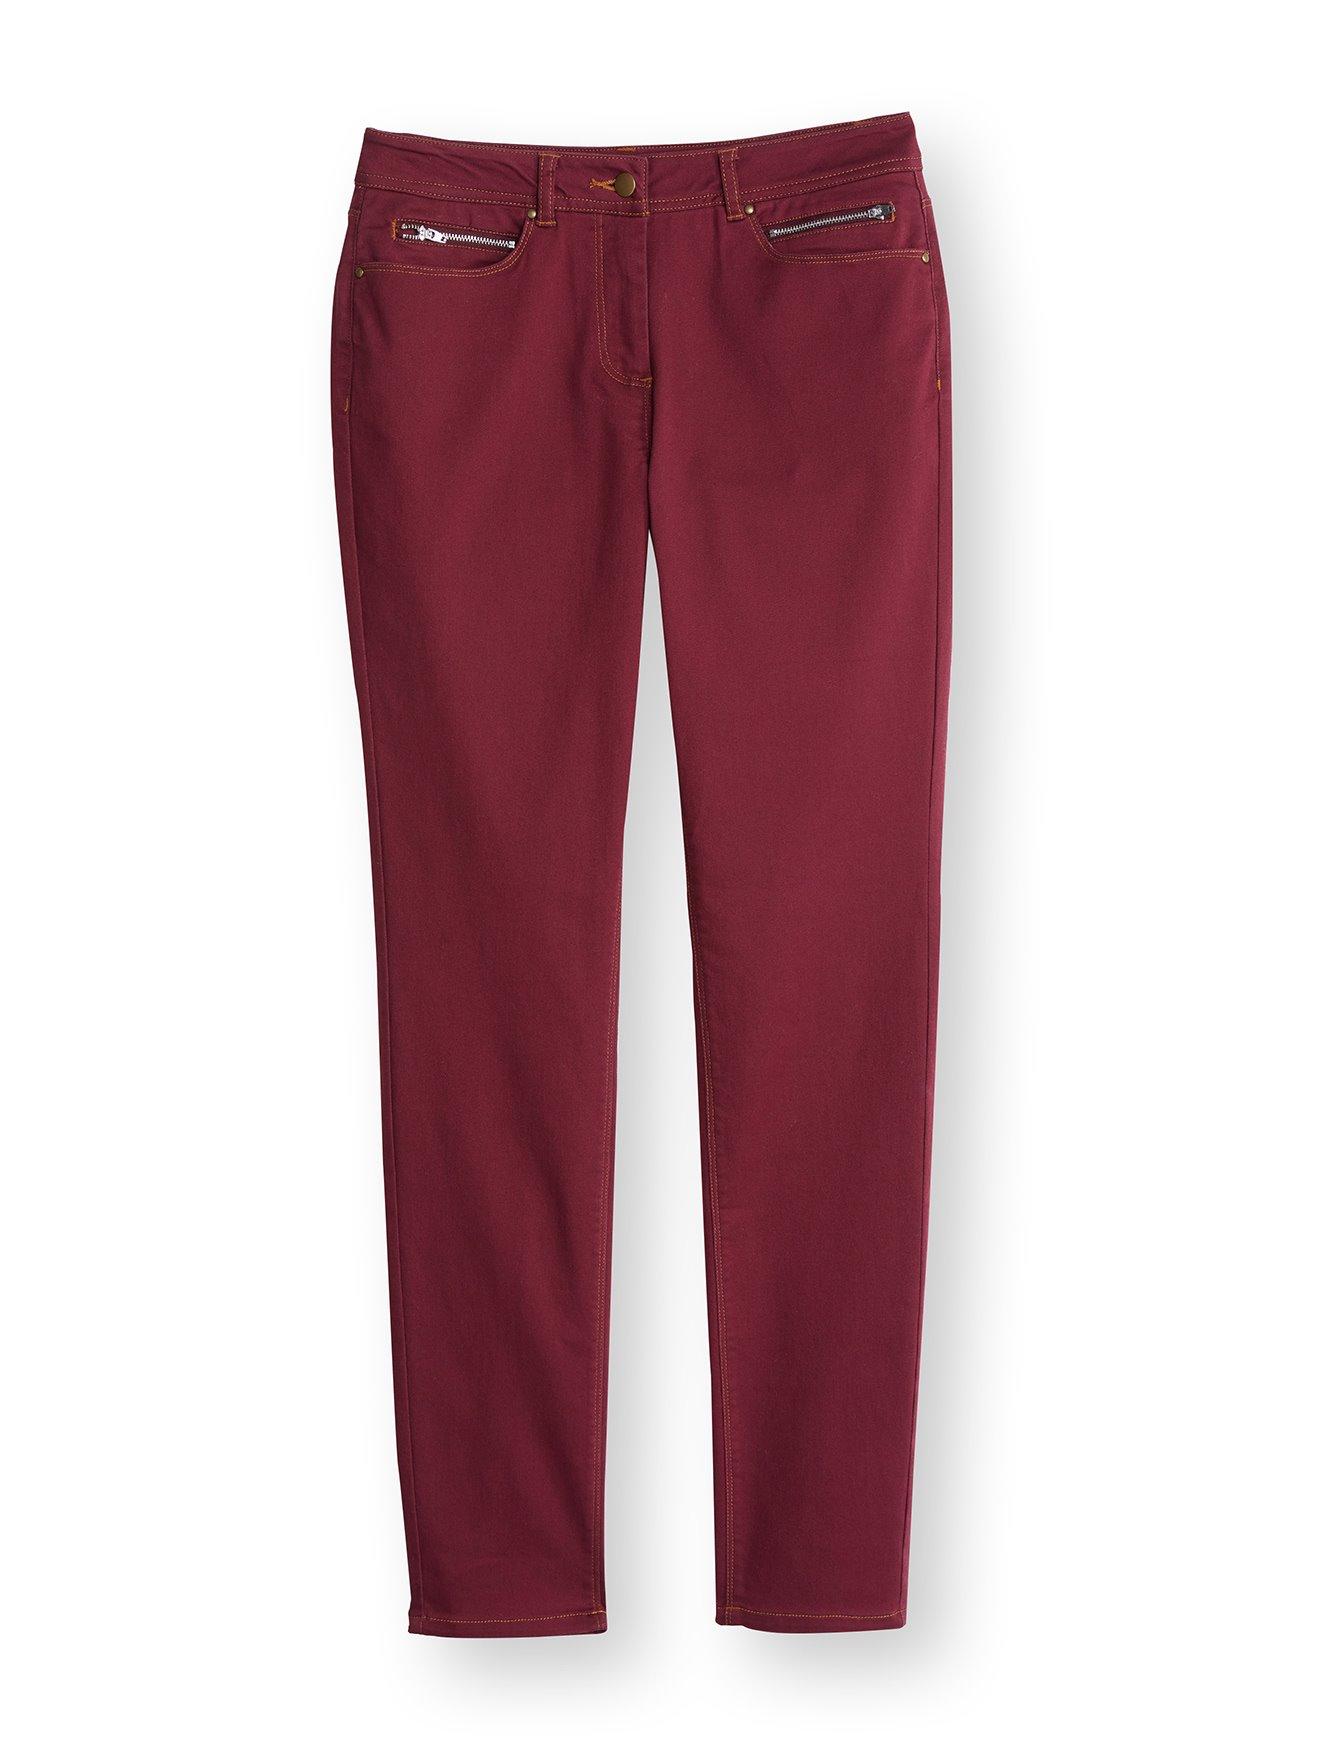 Pantalon Pantalon avec zippées zippées Pantalon Daxon poches poches Daxon avec avec YPfHqwYx